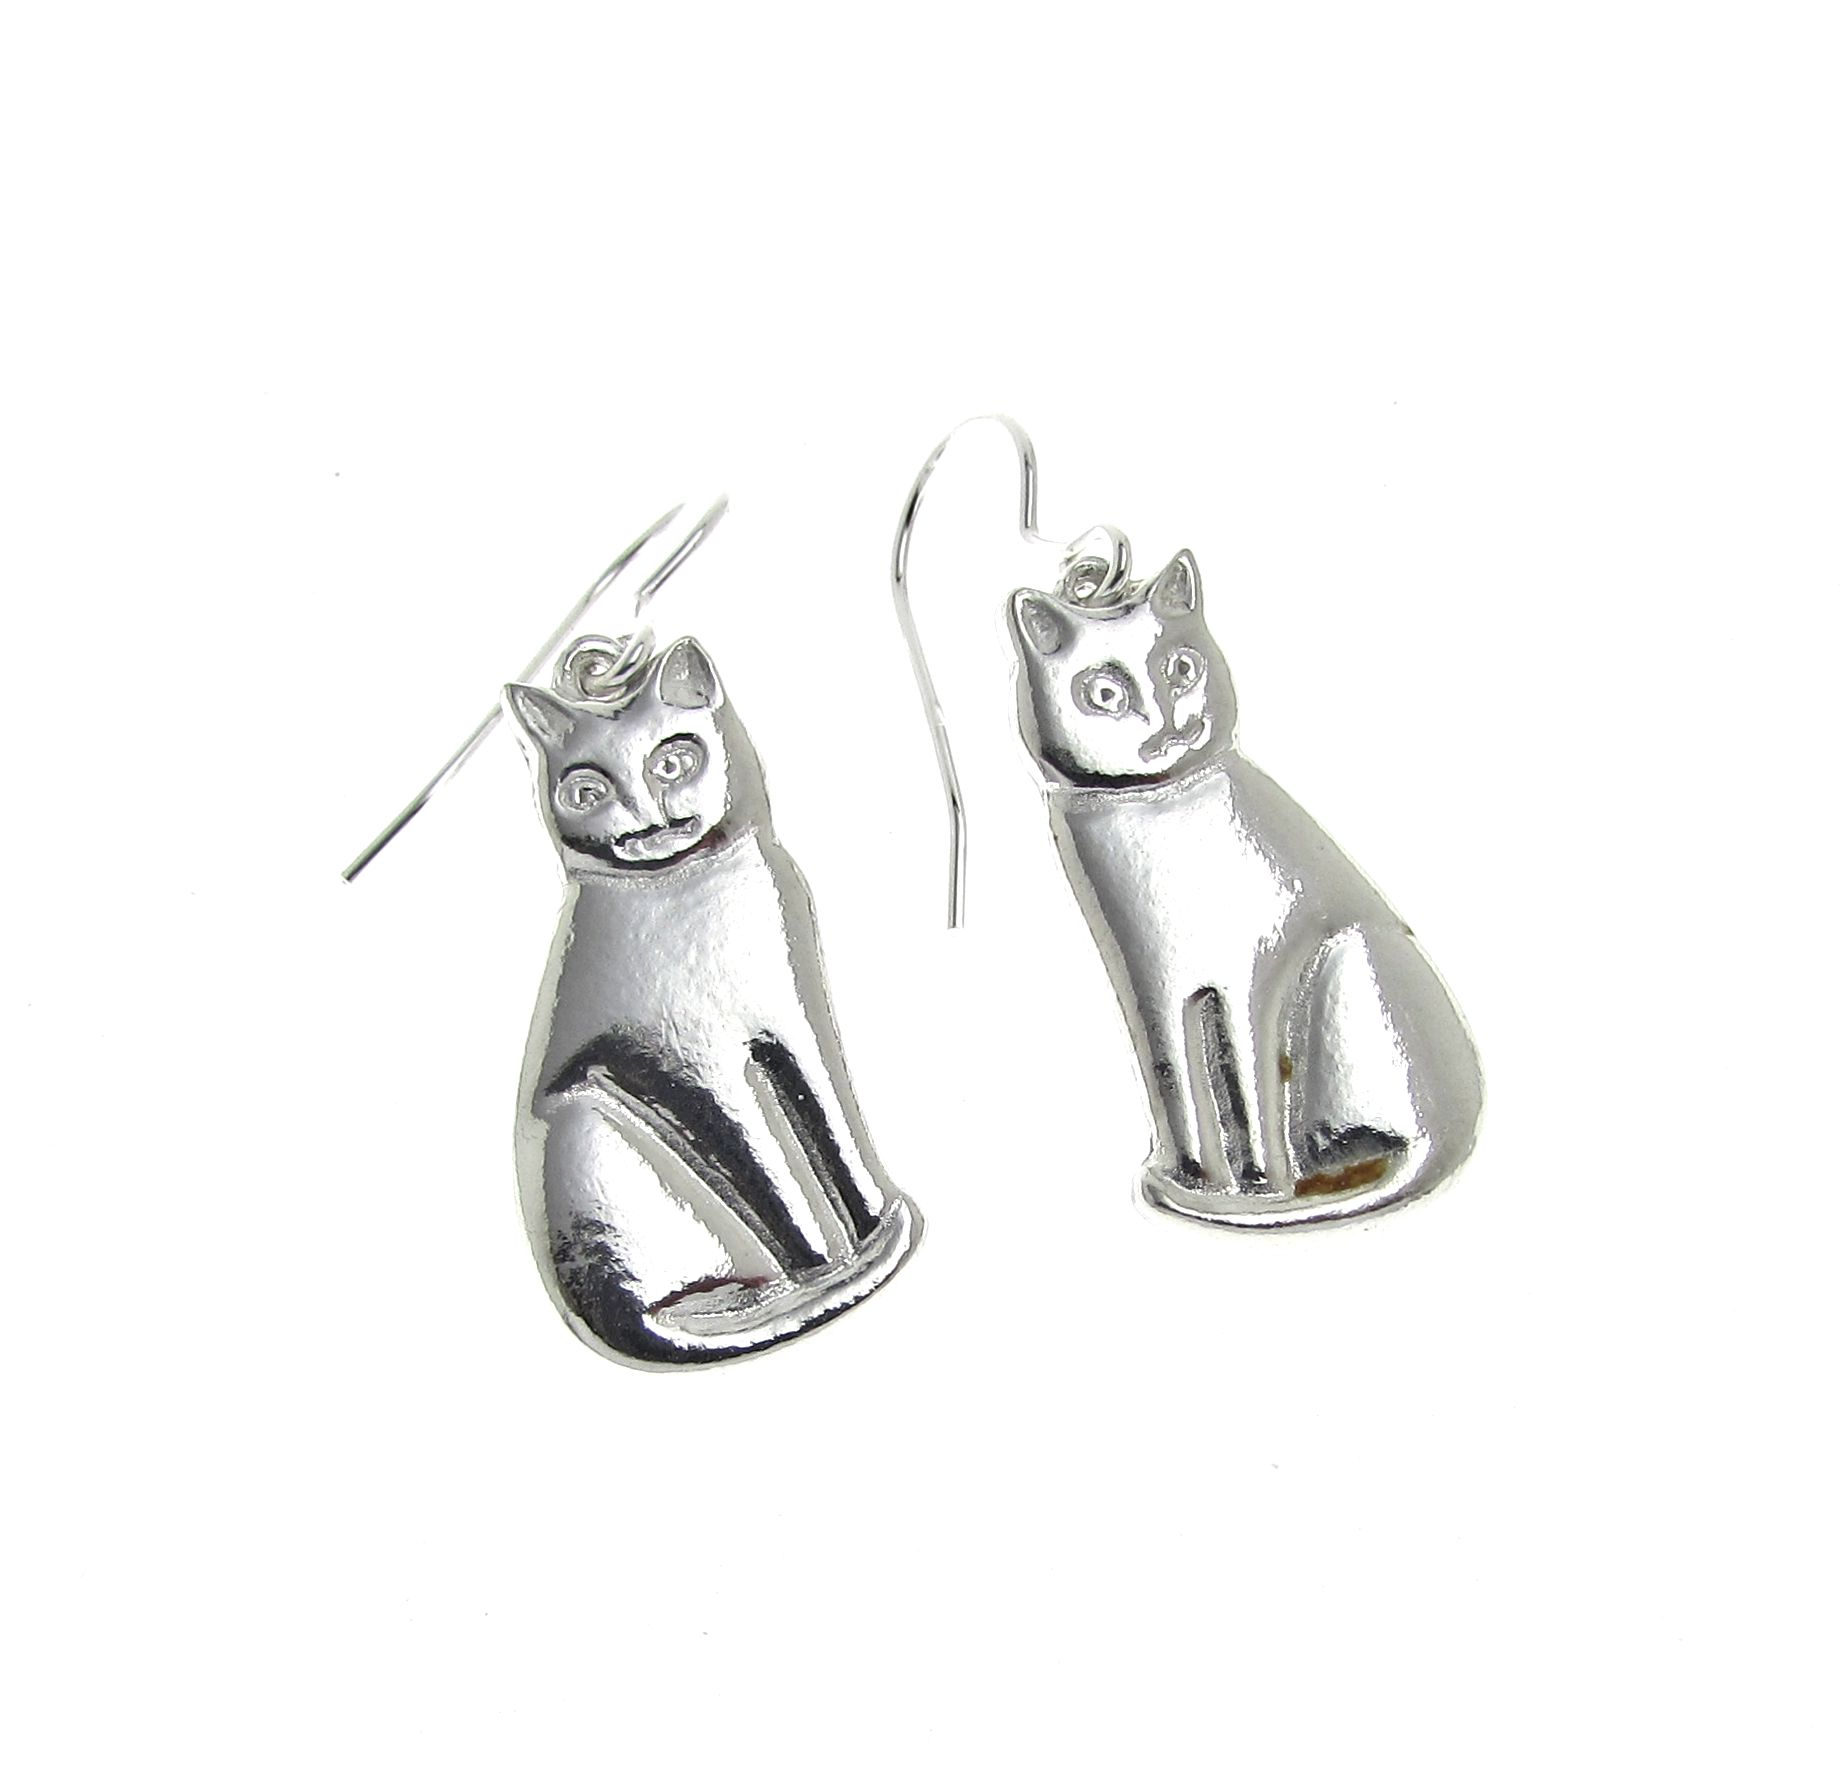 Cat earrings cast in Cornish tin